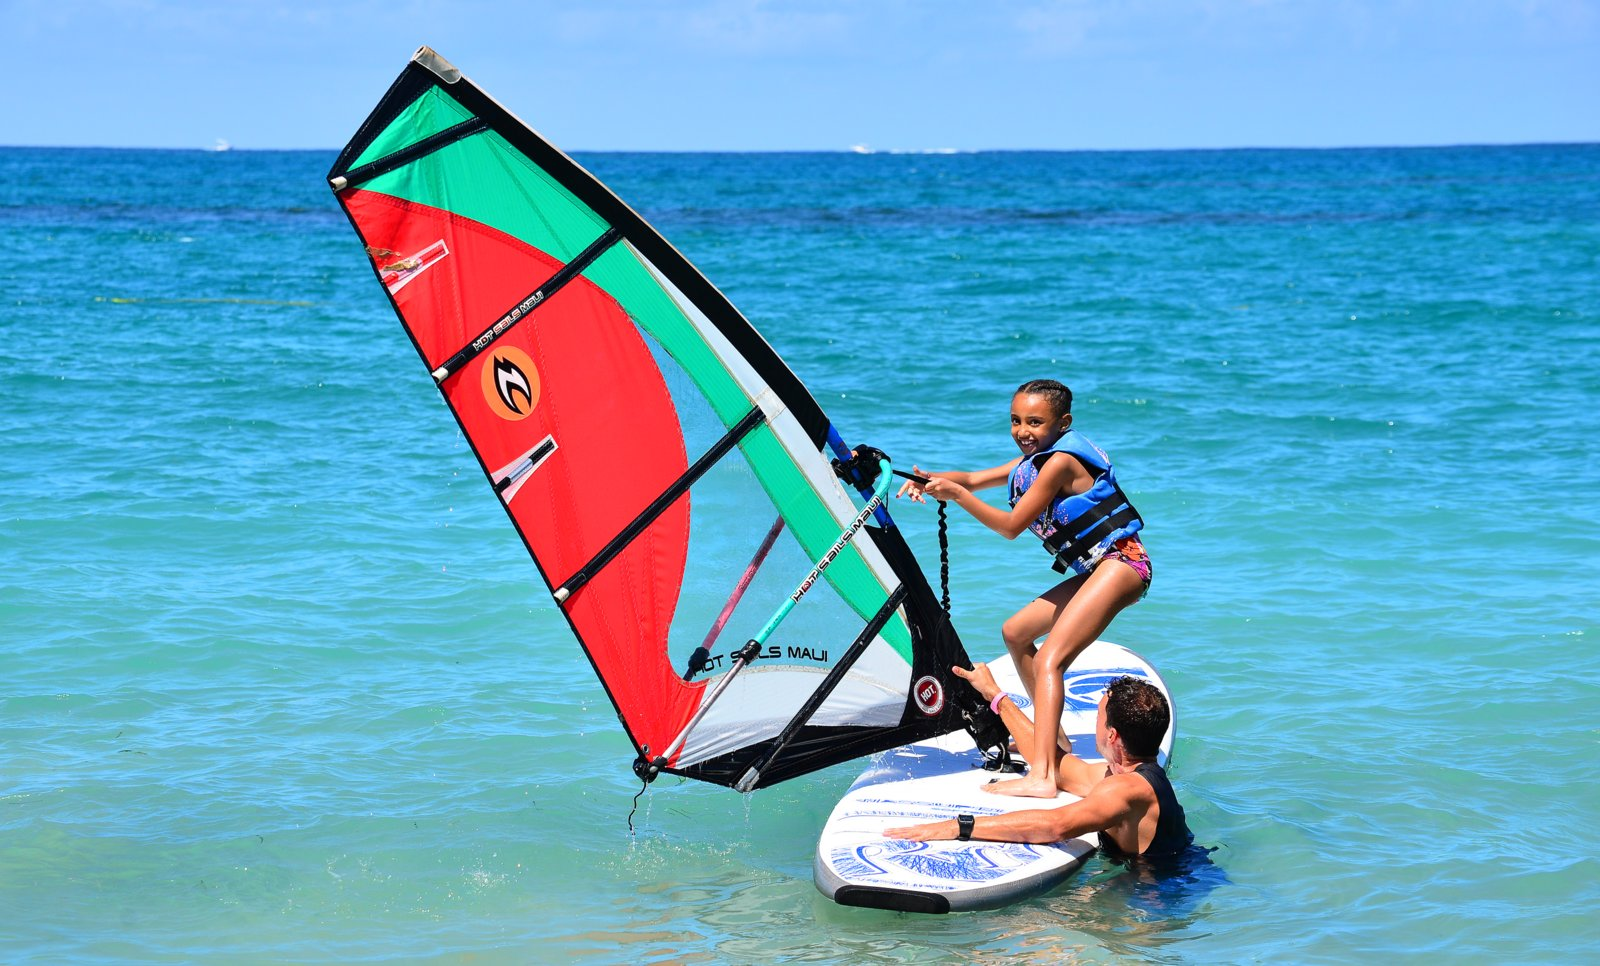 Windsurf beginner